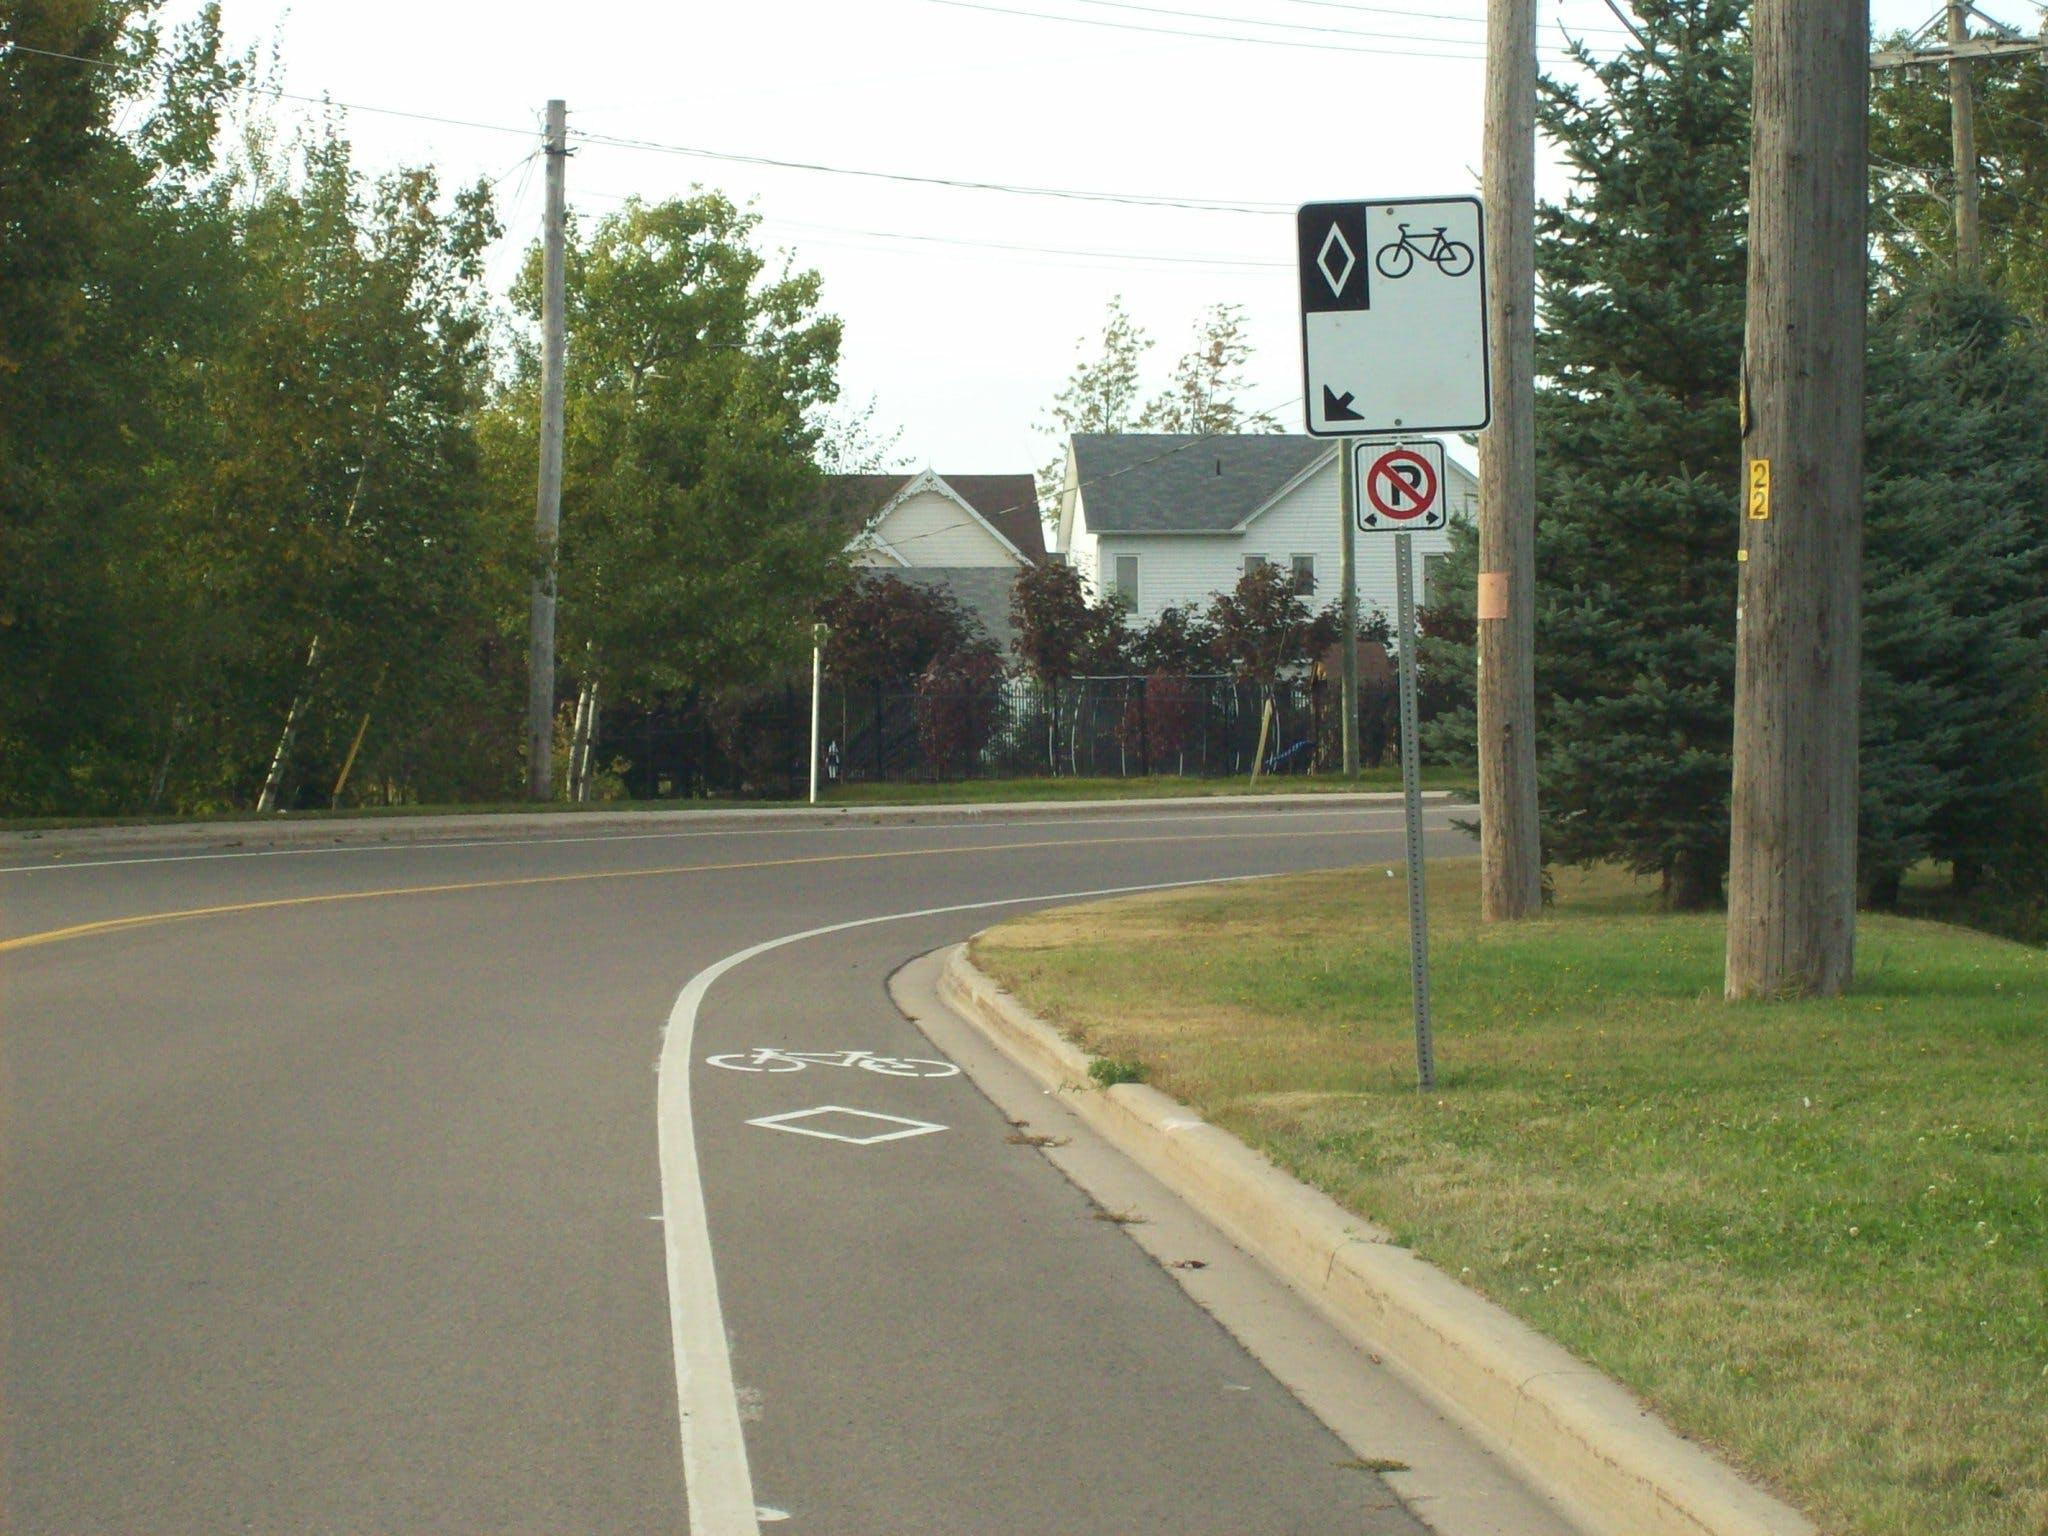 Bike lane - Ryan Street